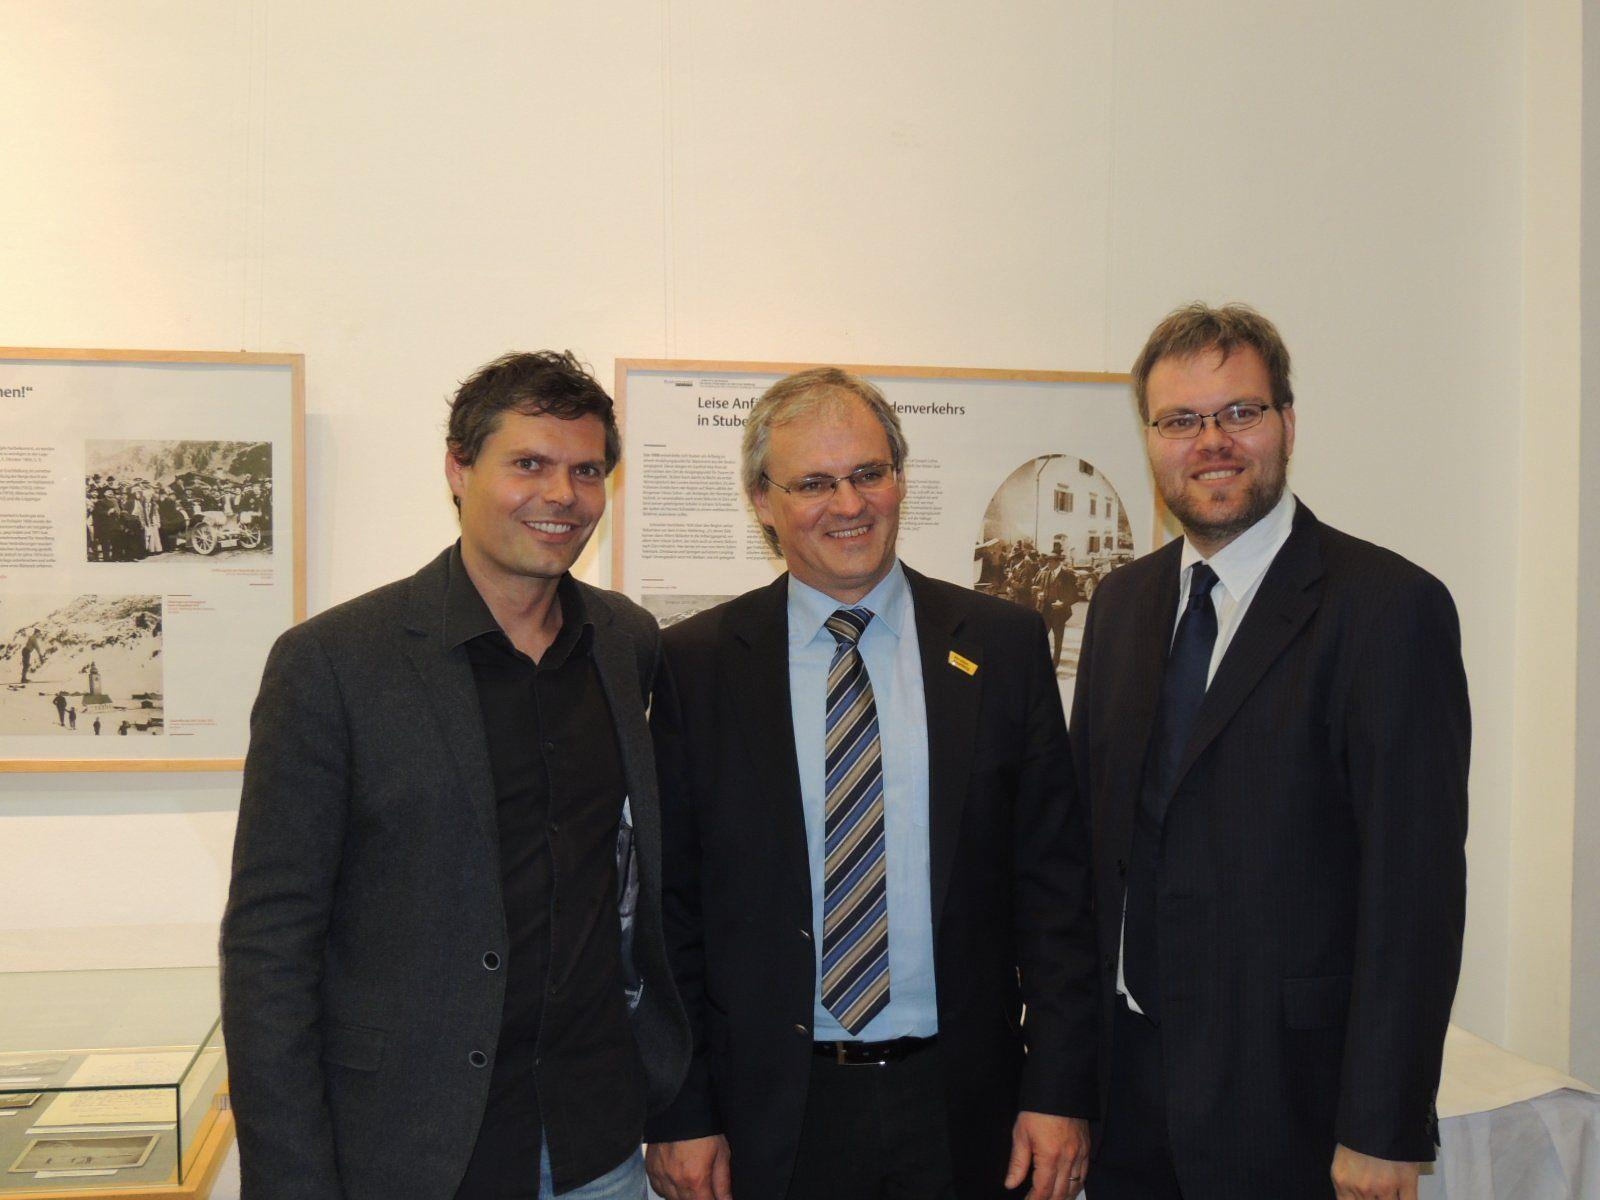 Archivar Oliver Heinzle, LR Sonderegger und Dr. Andreas Brugger